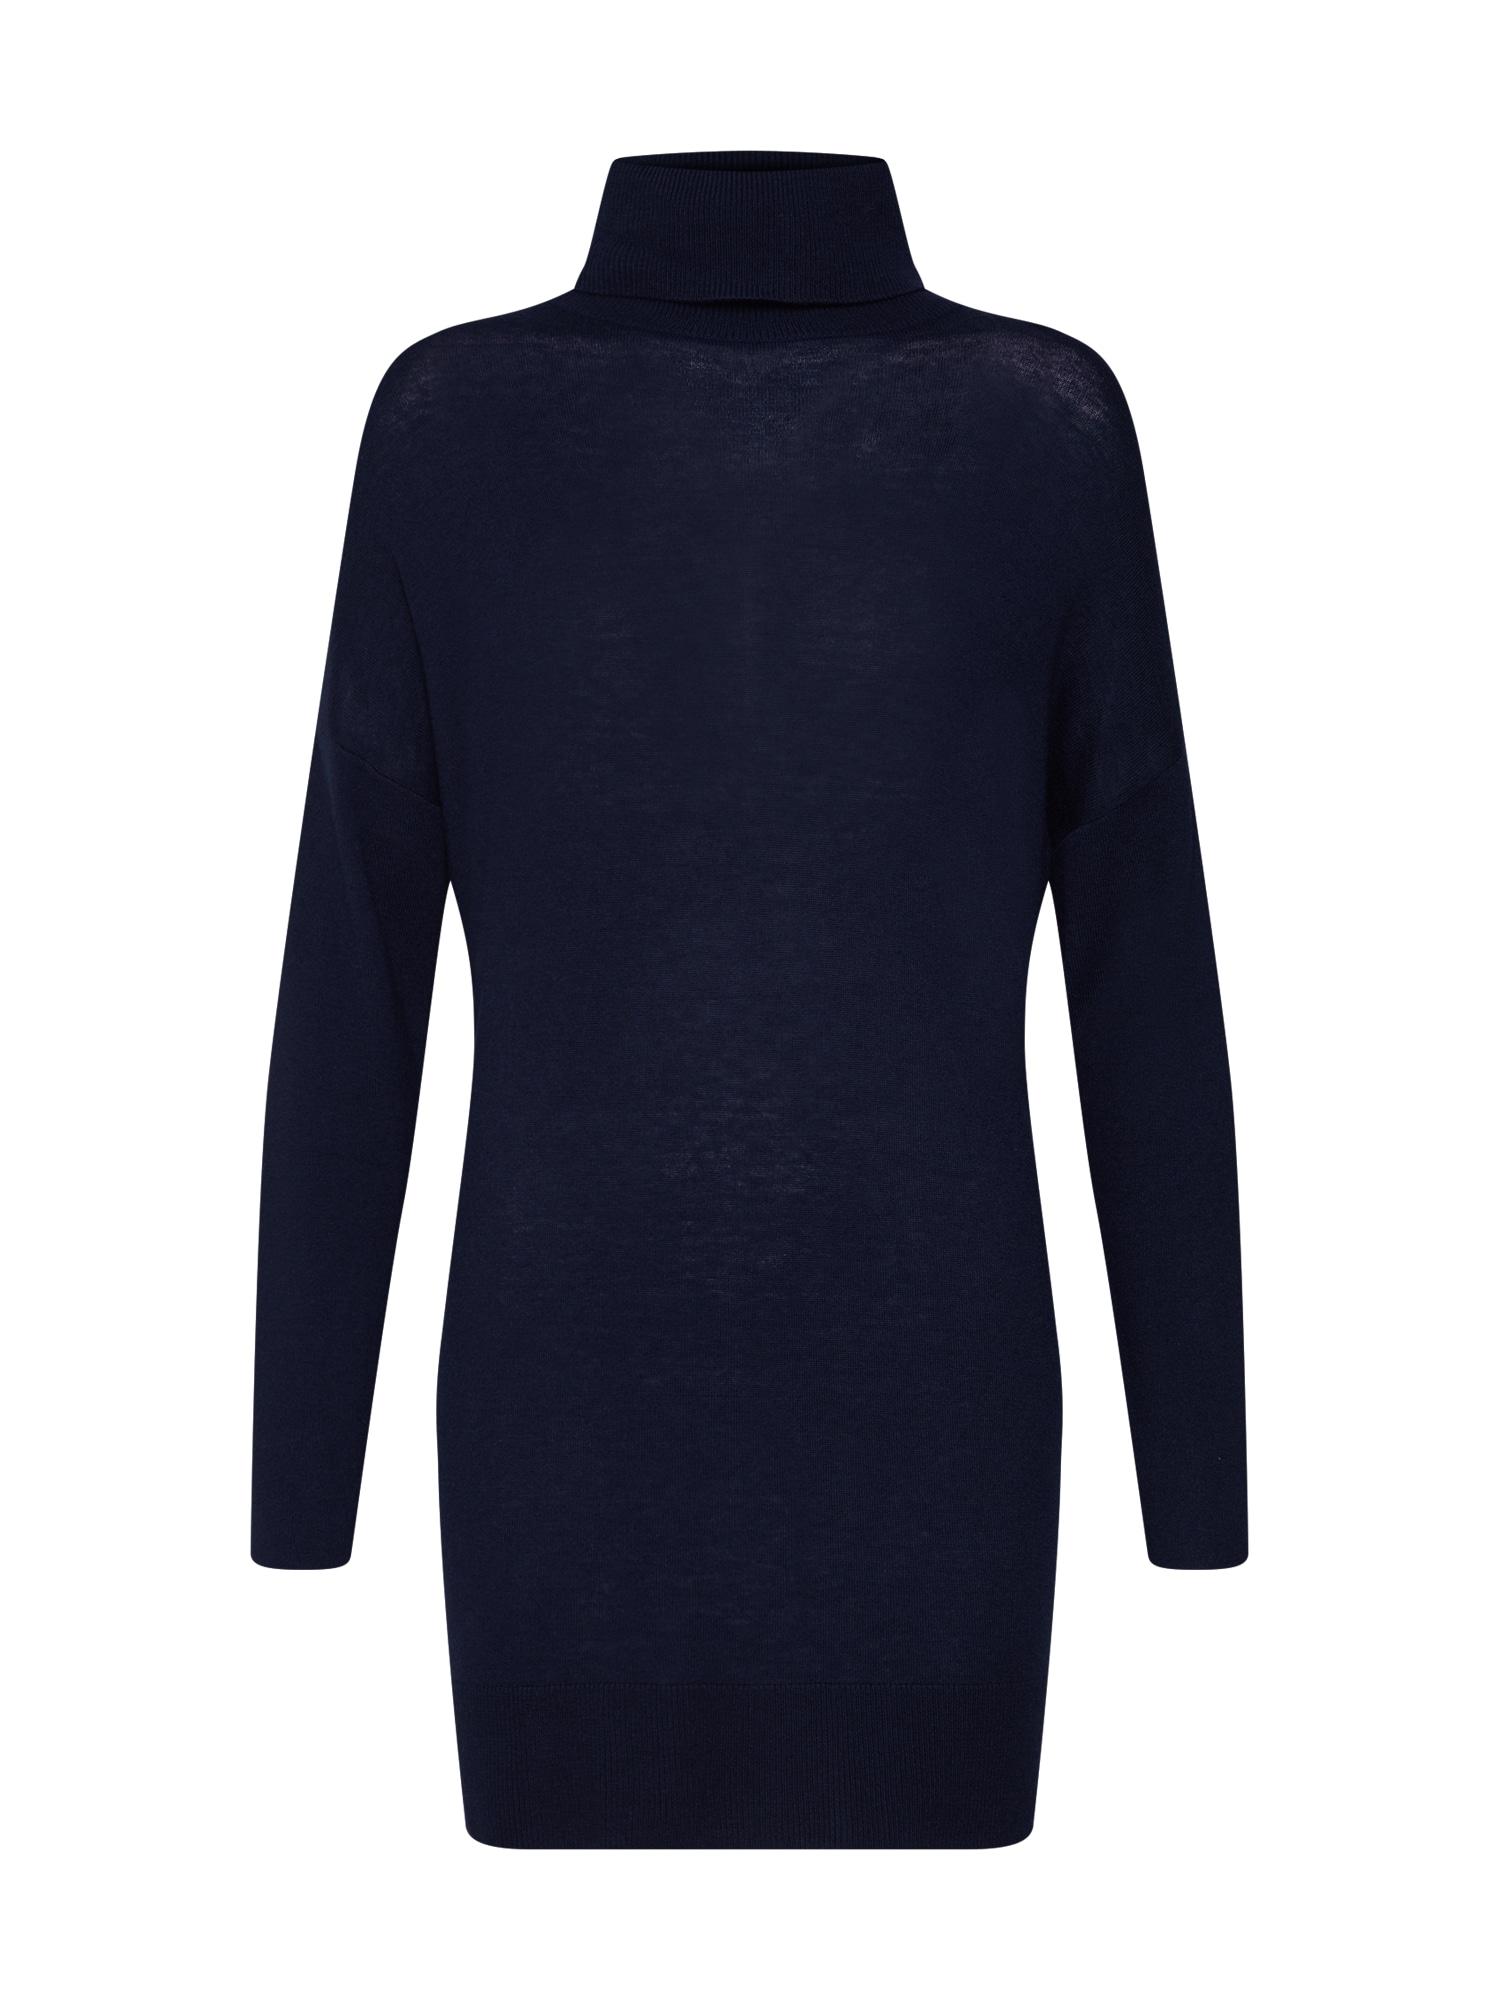 Damen EDITED Pullover 'Cleopha' blau | 04063062316898